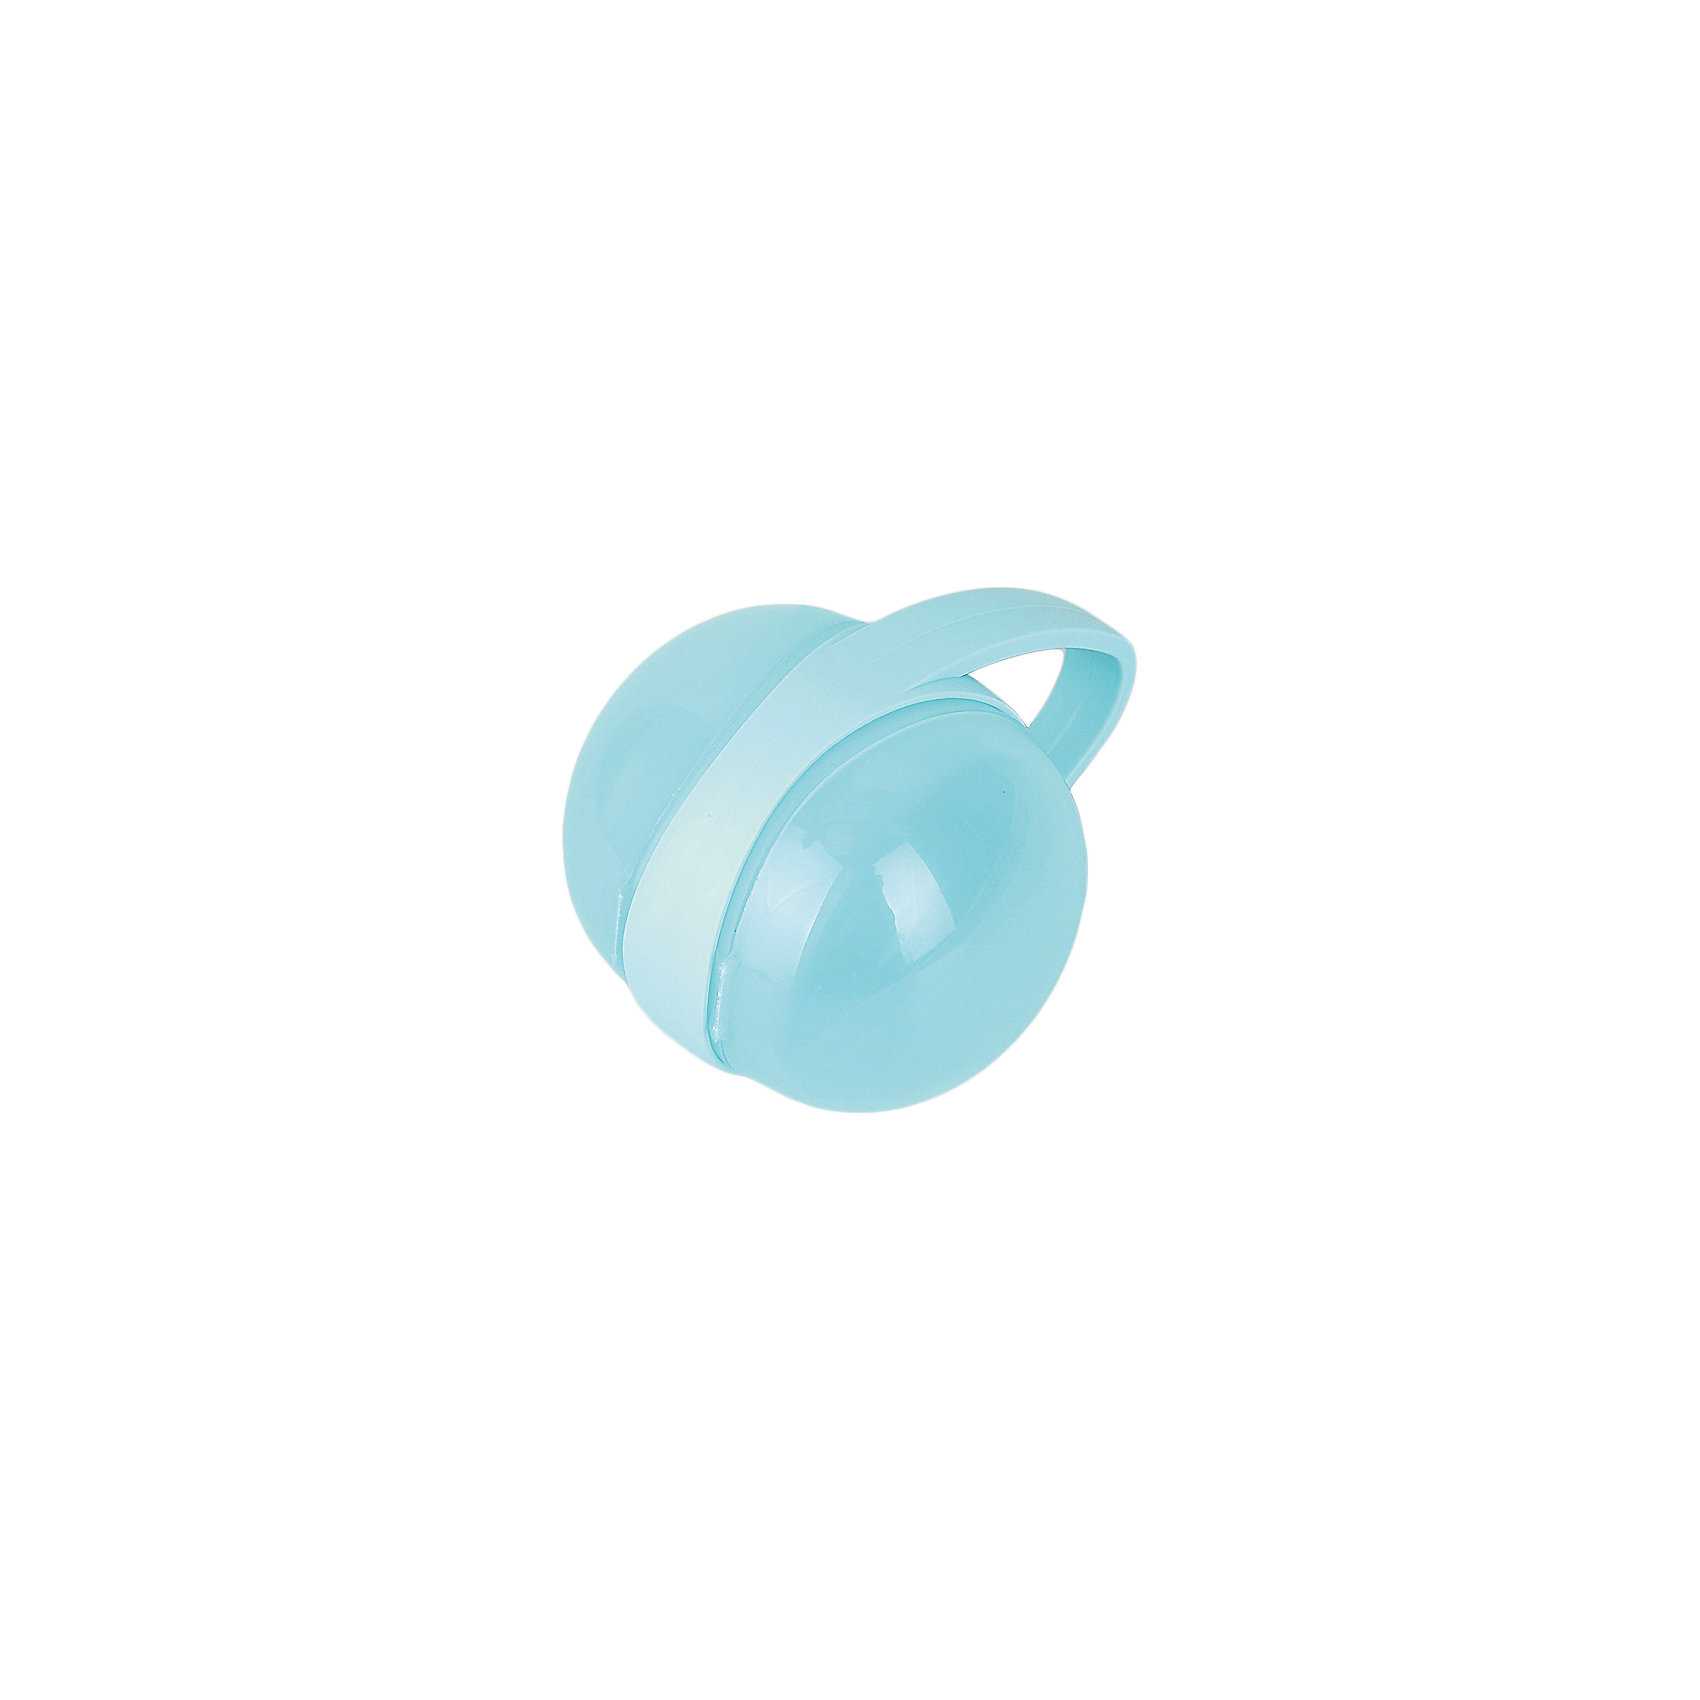 Контейнер для пустышки от 0 мес, Suavinex, голубой